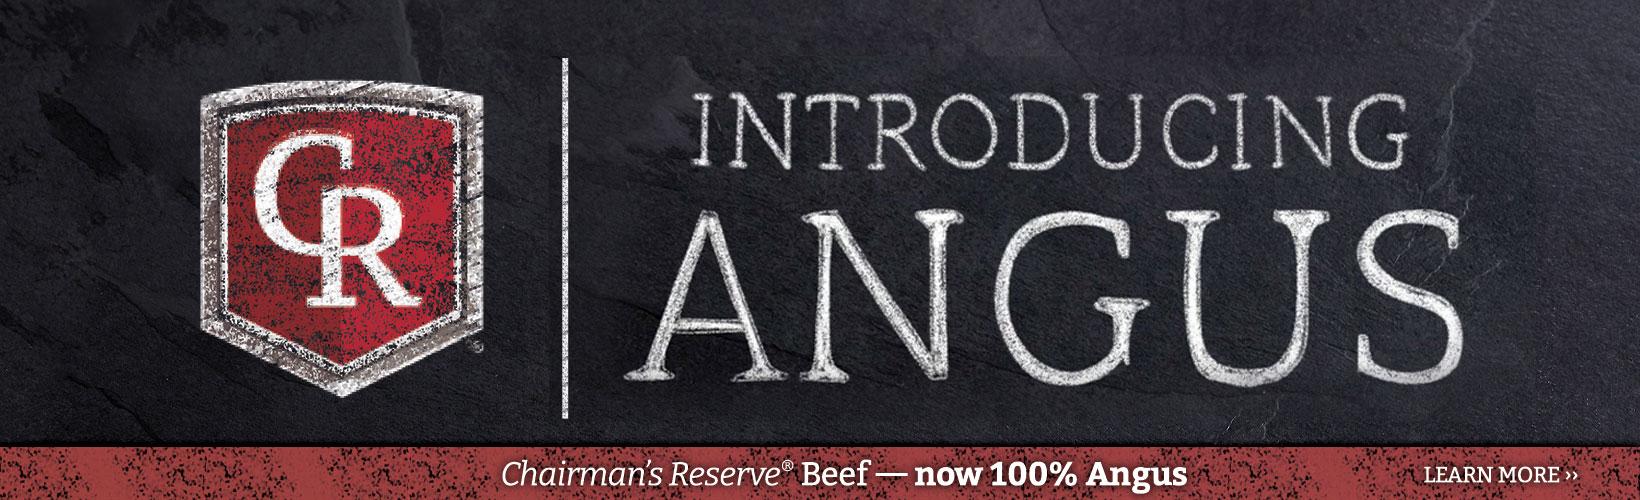 Introducing Angus